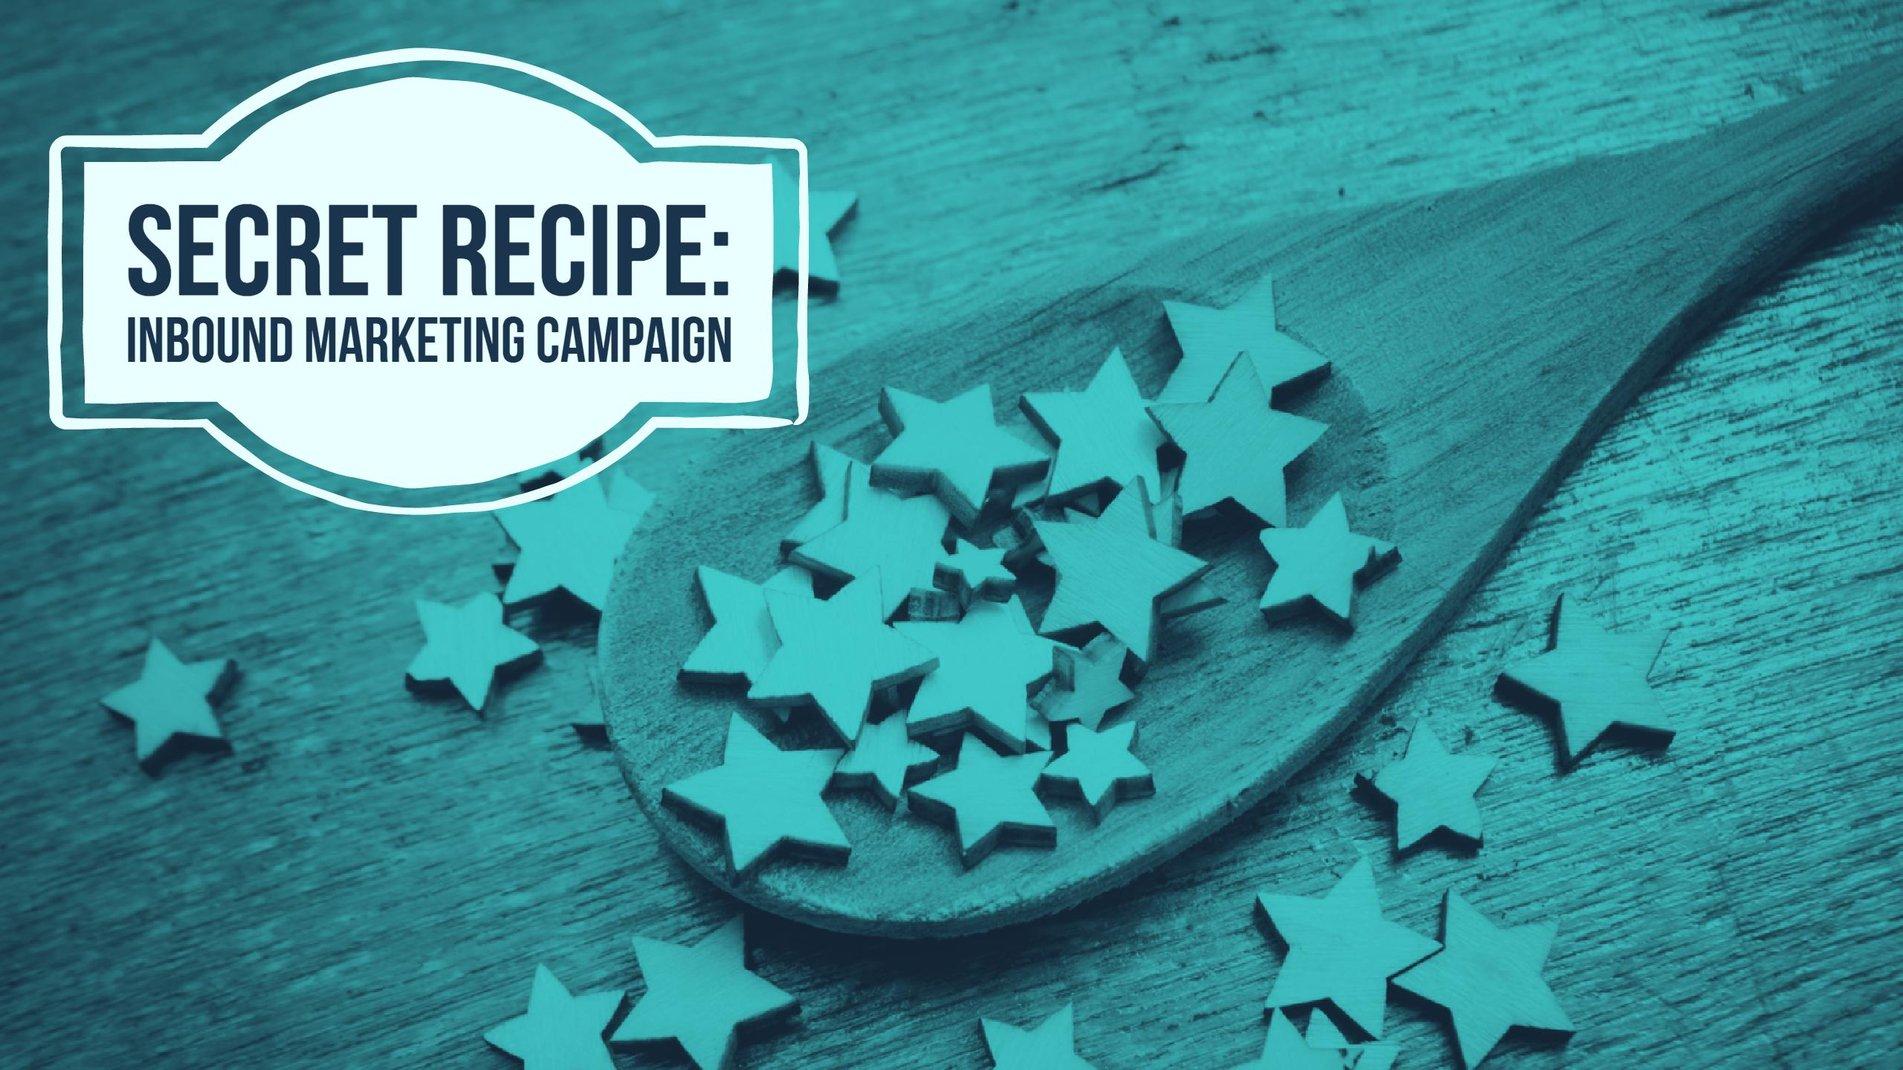 My Secret Recipe for a Winning Inbound Marketing Campaign